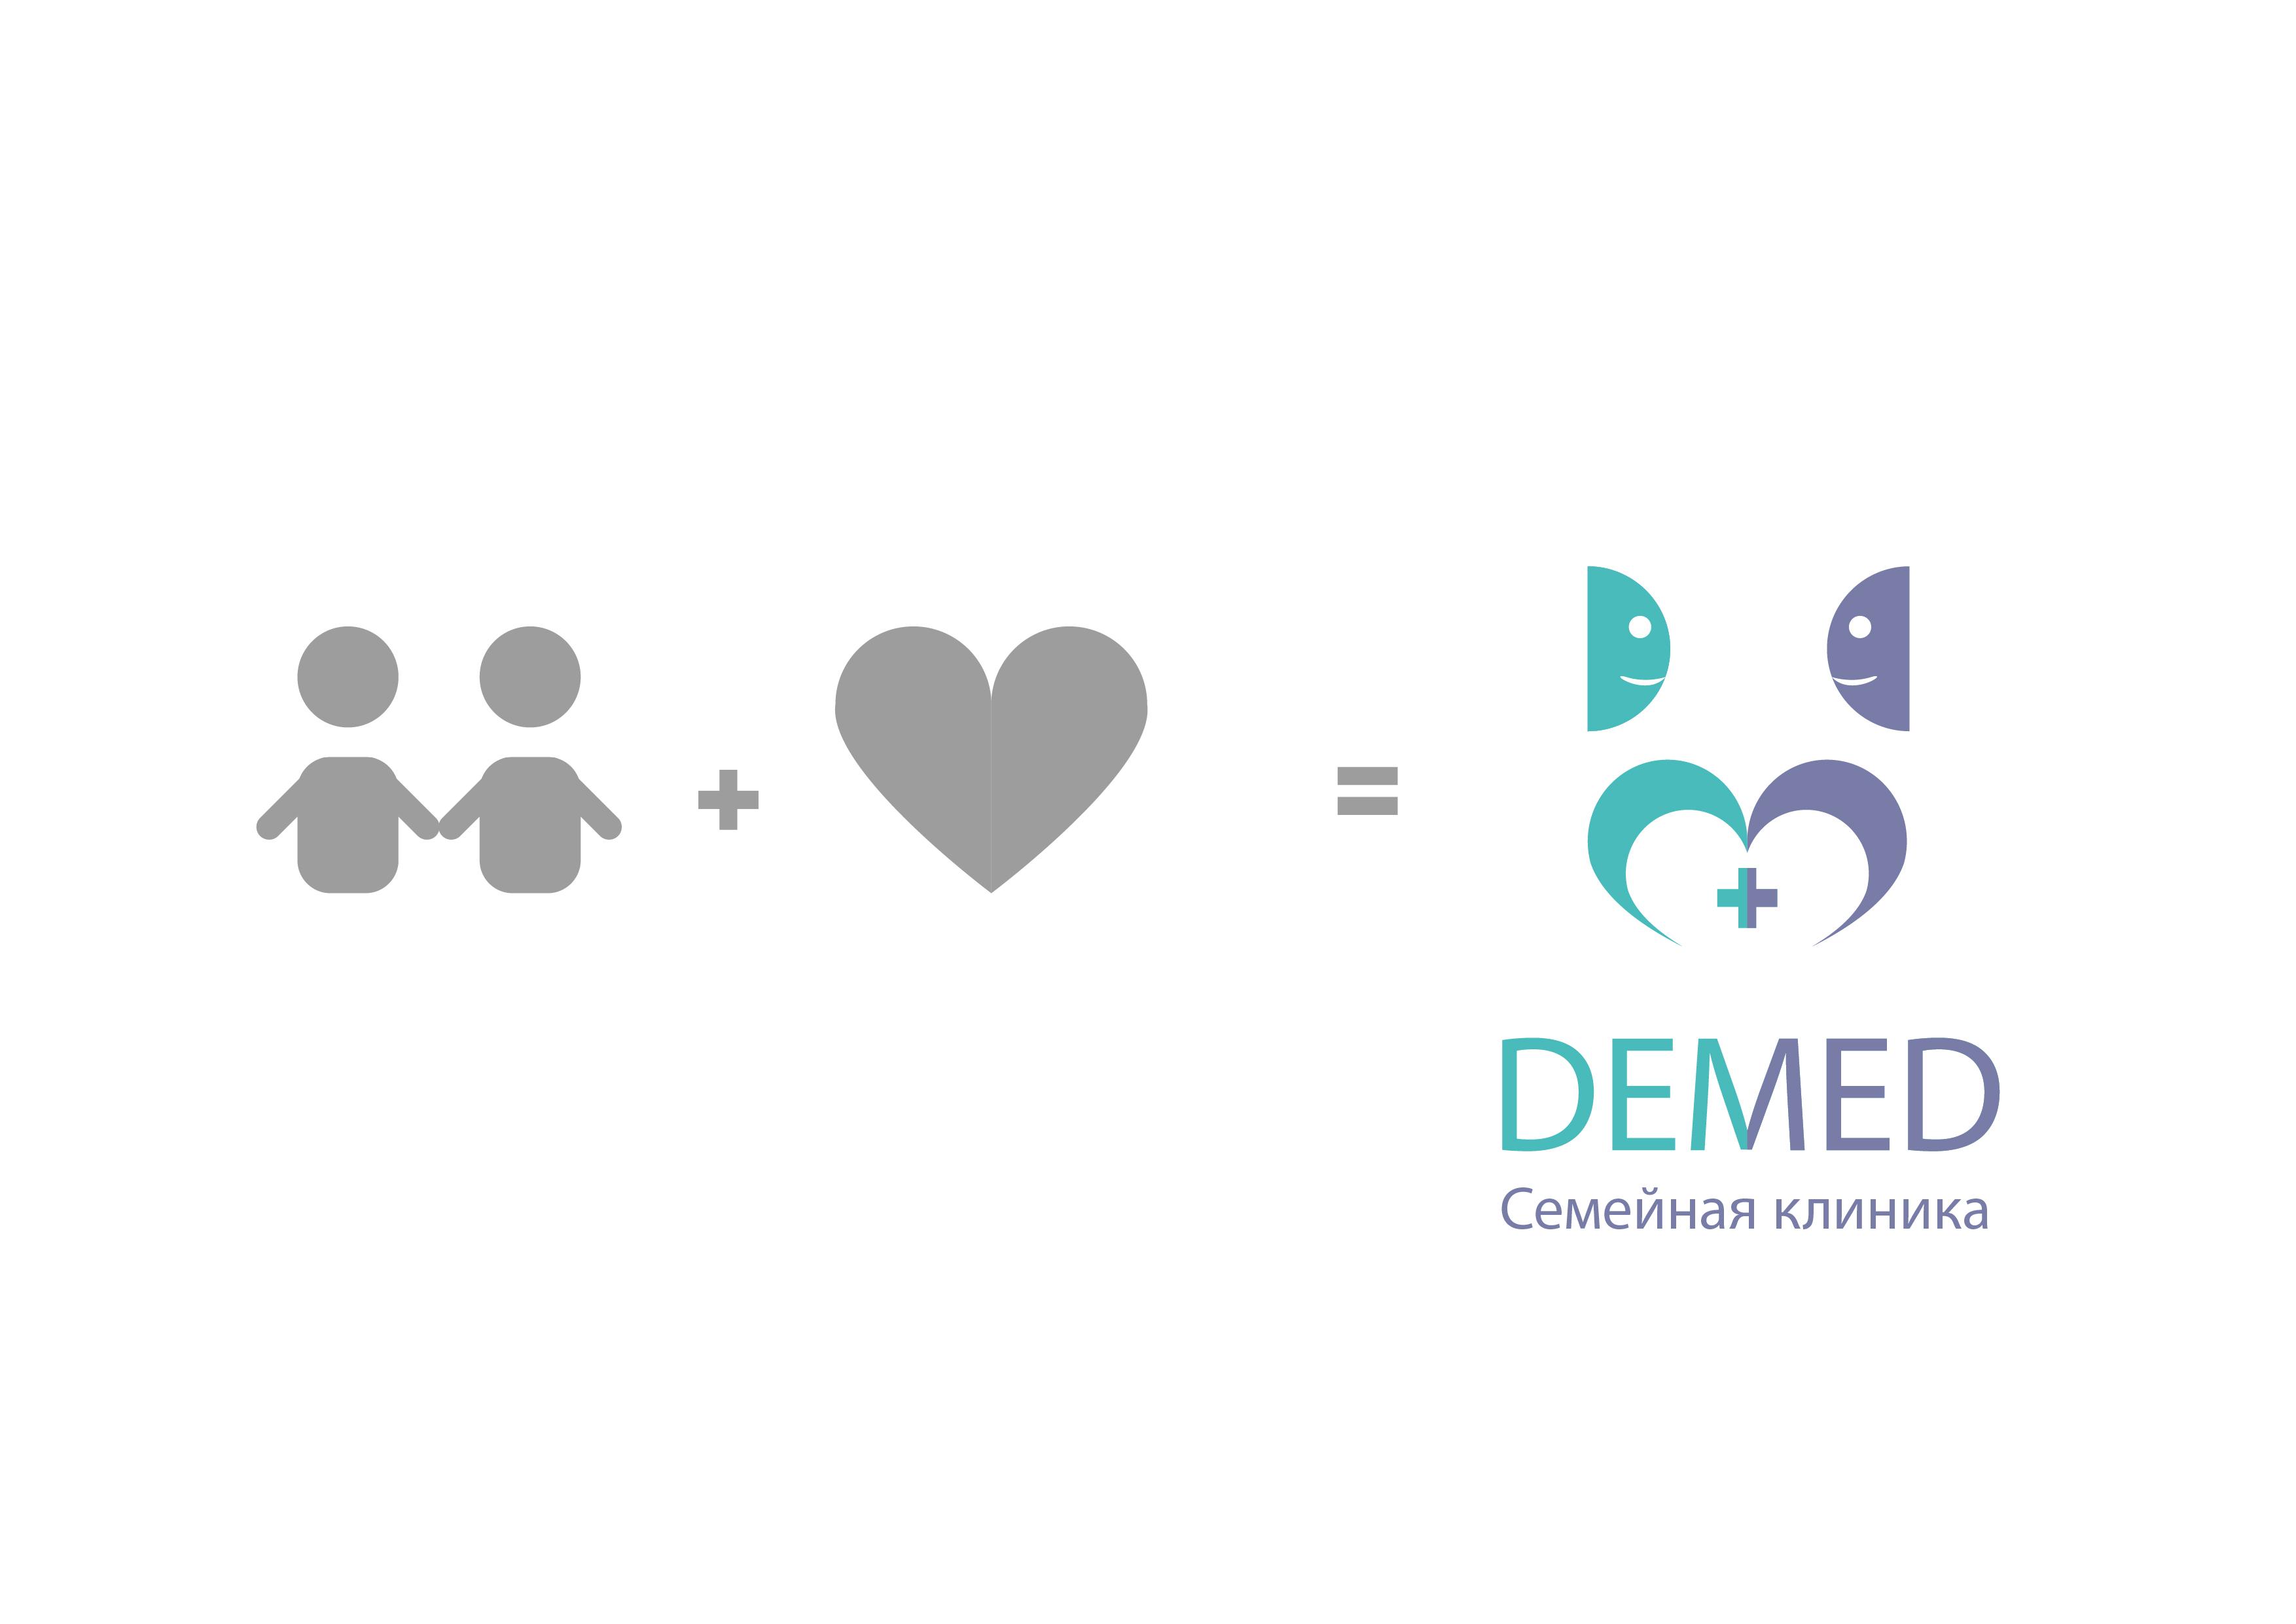 Логотип медицинского центра фото f_6255dc8f677de53e.jpg